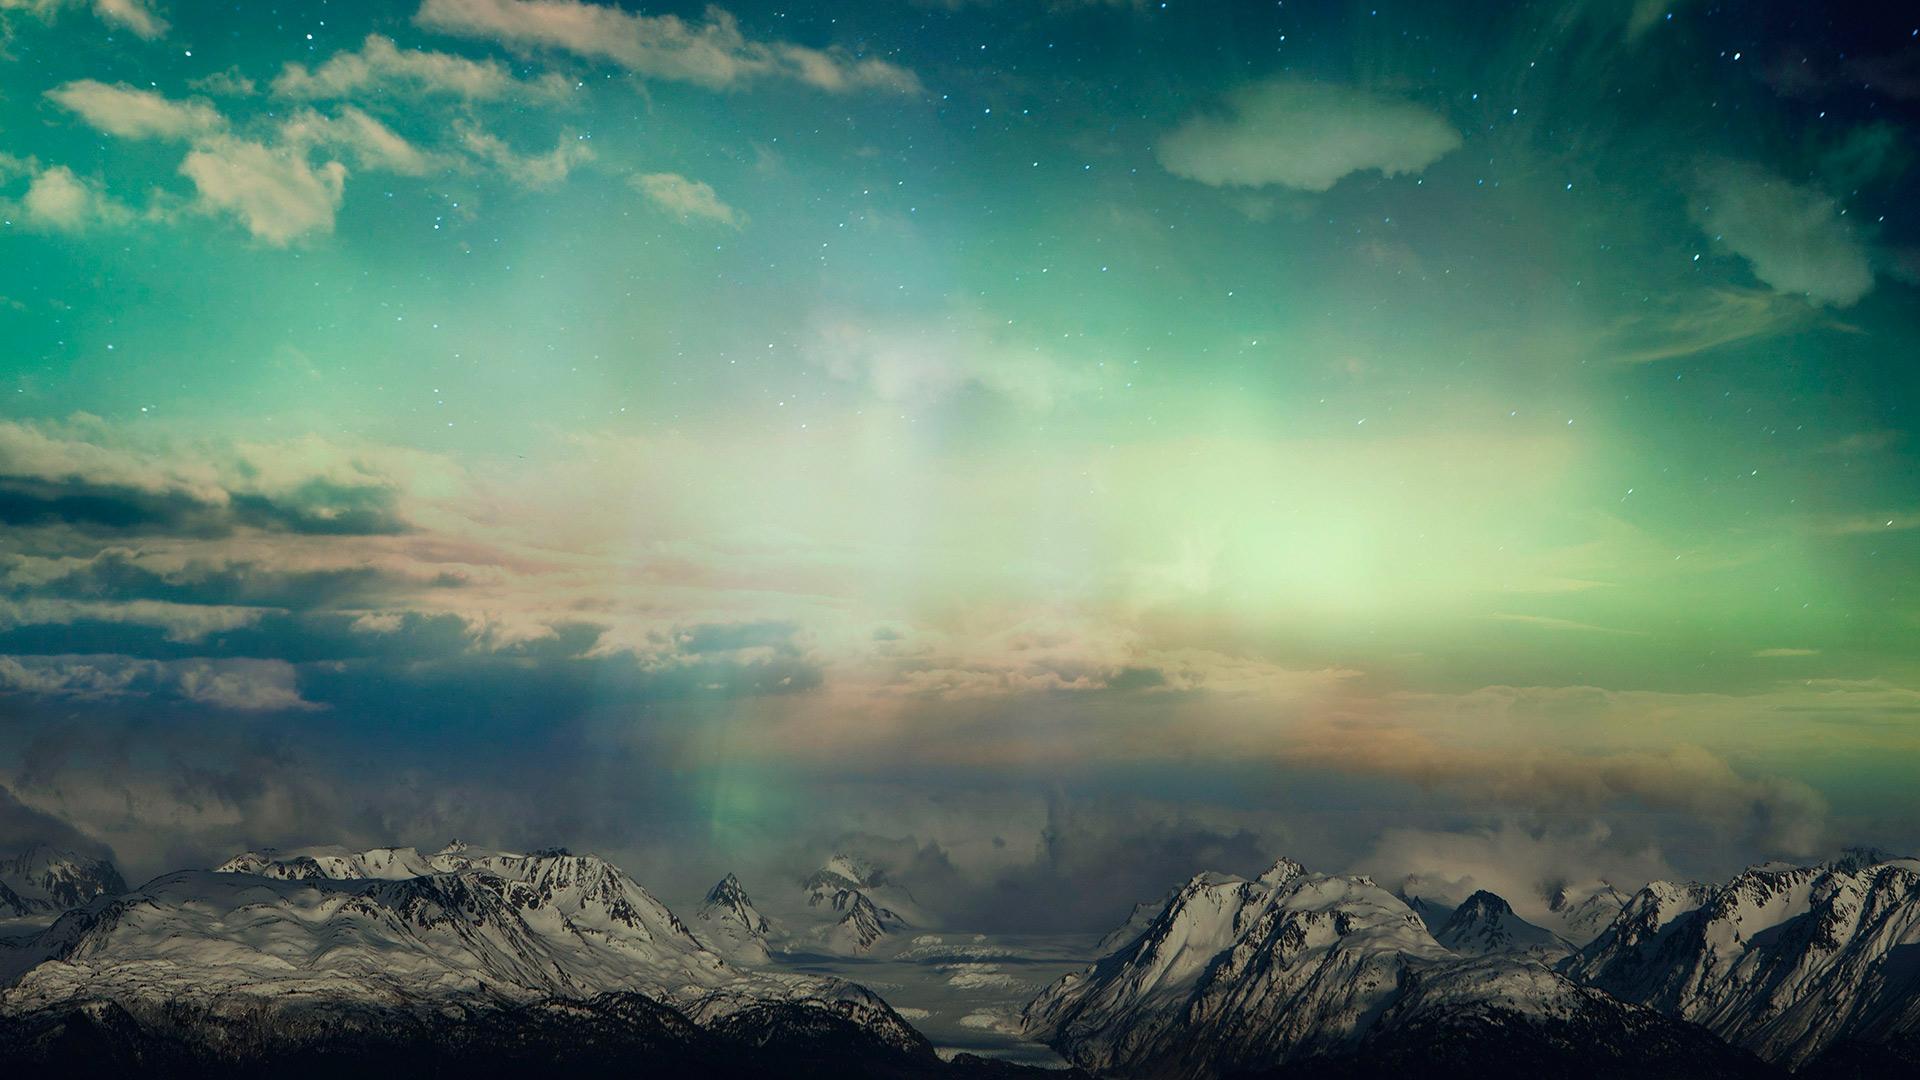 Light, Cloud, Nature, Outdoors, Sky resized by Ze Robot